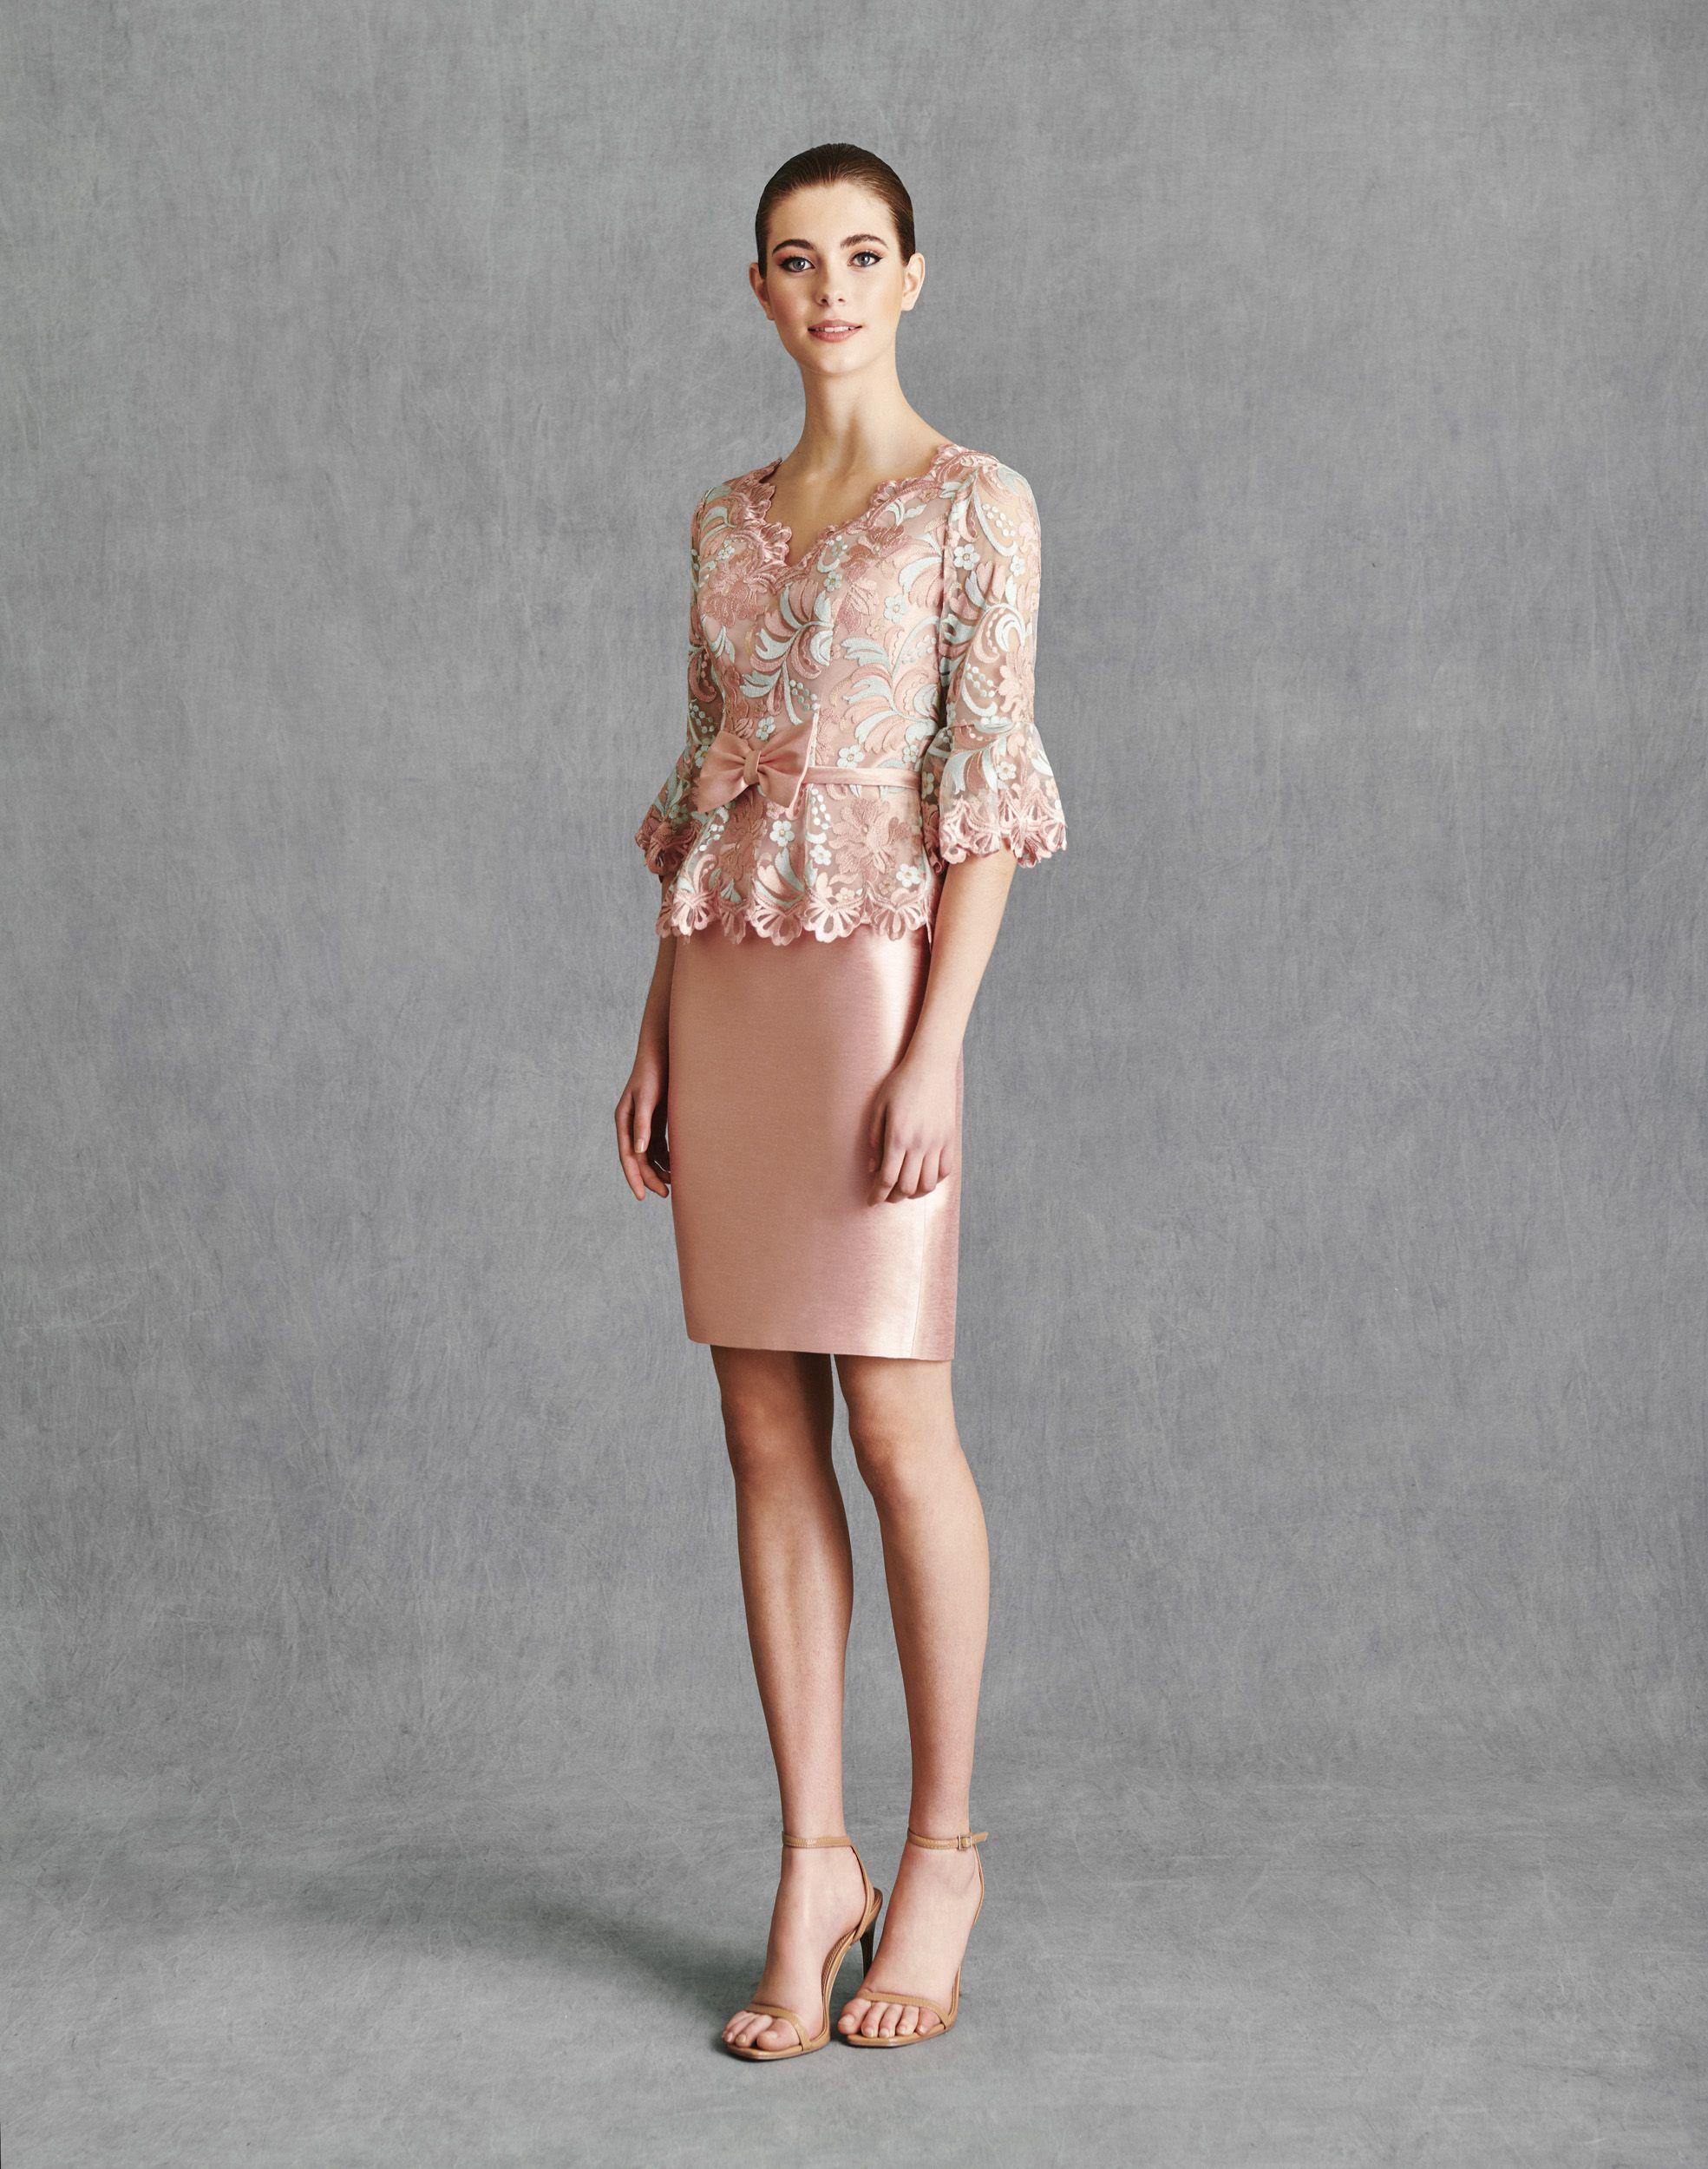 Vestidos de Fiesta 2020 - Silvia Fernandez Atelier - INGRID